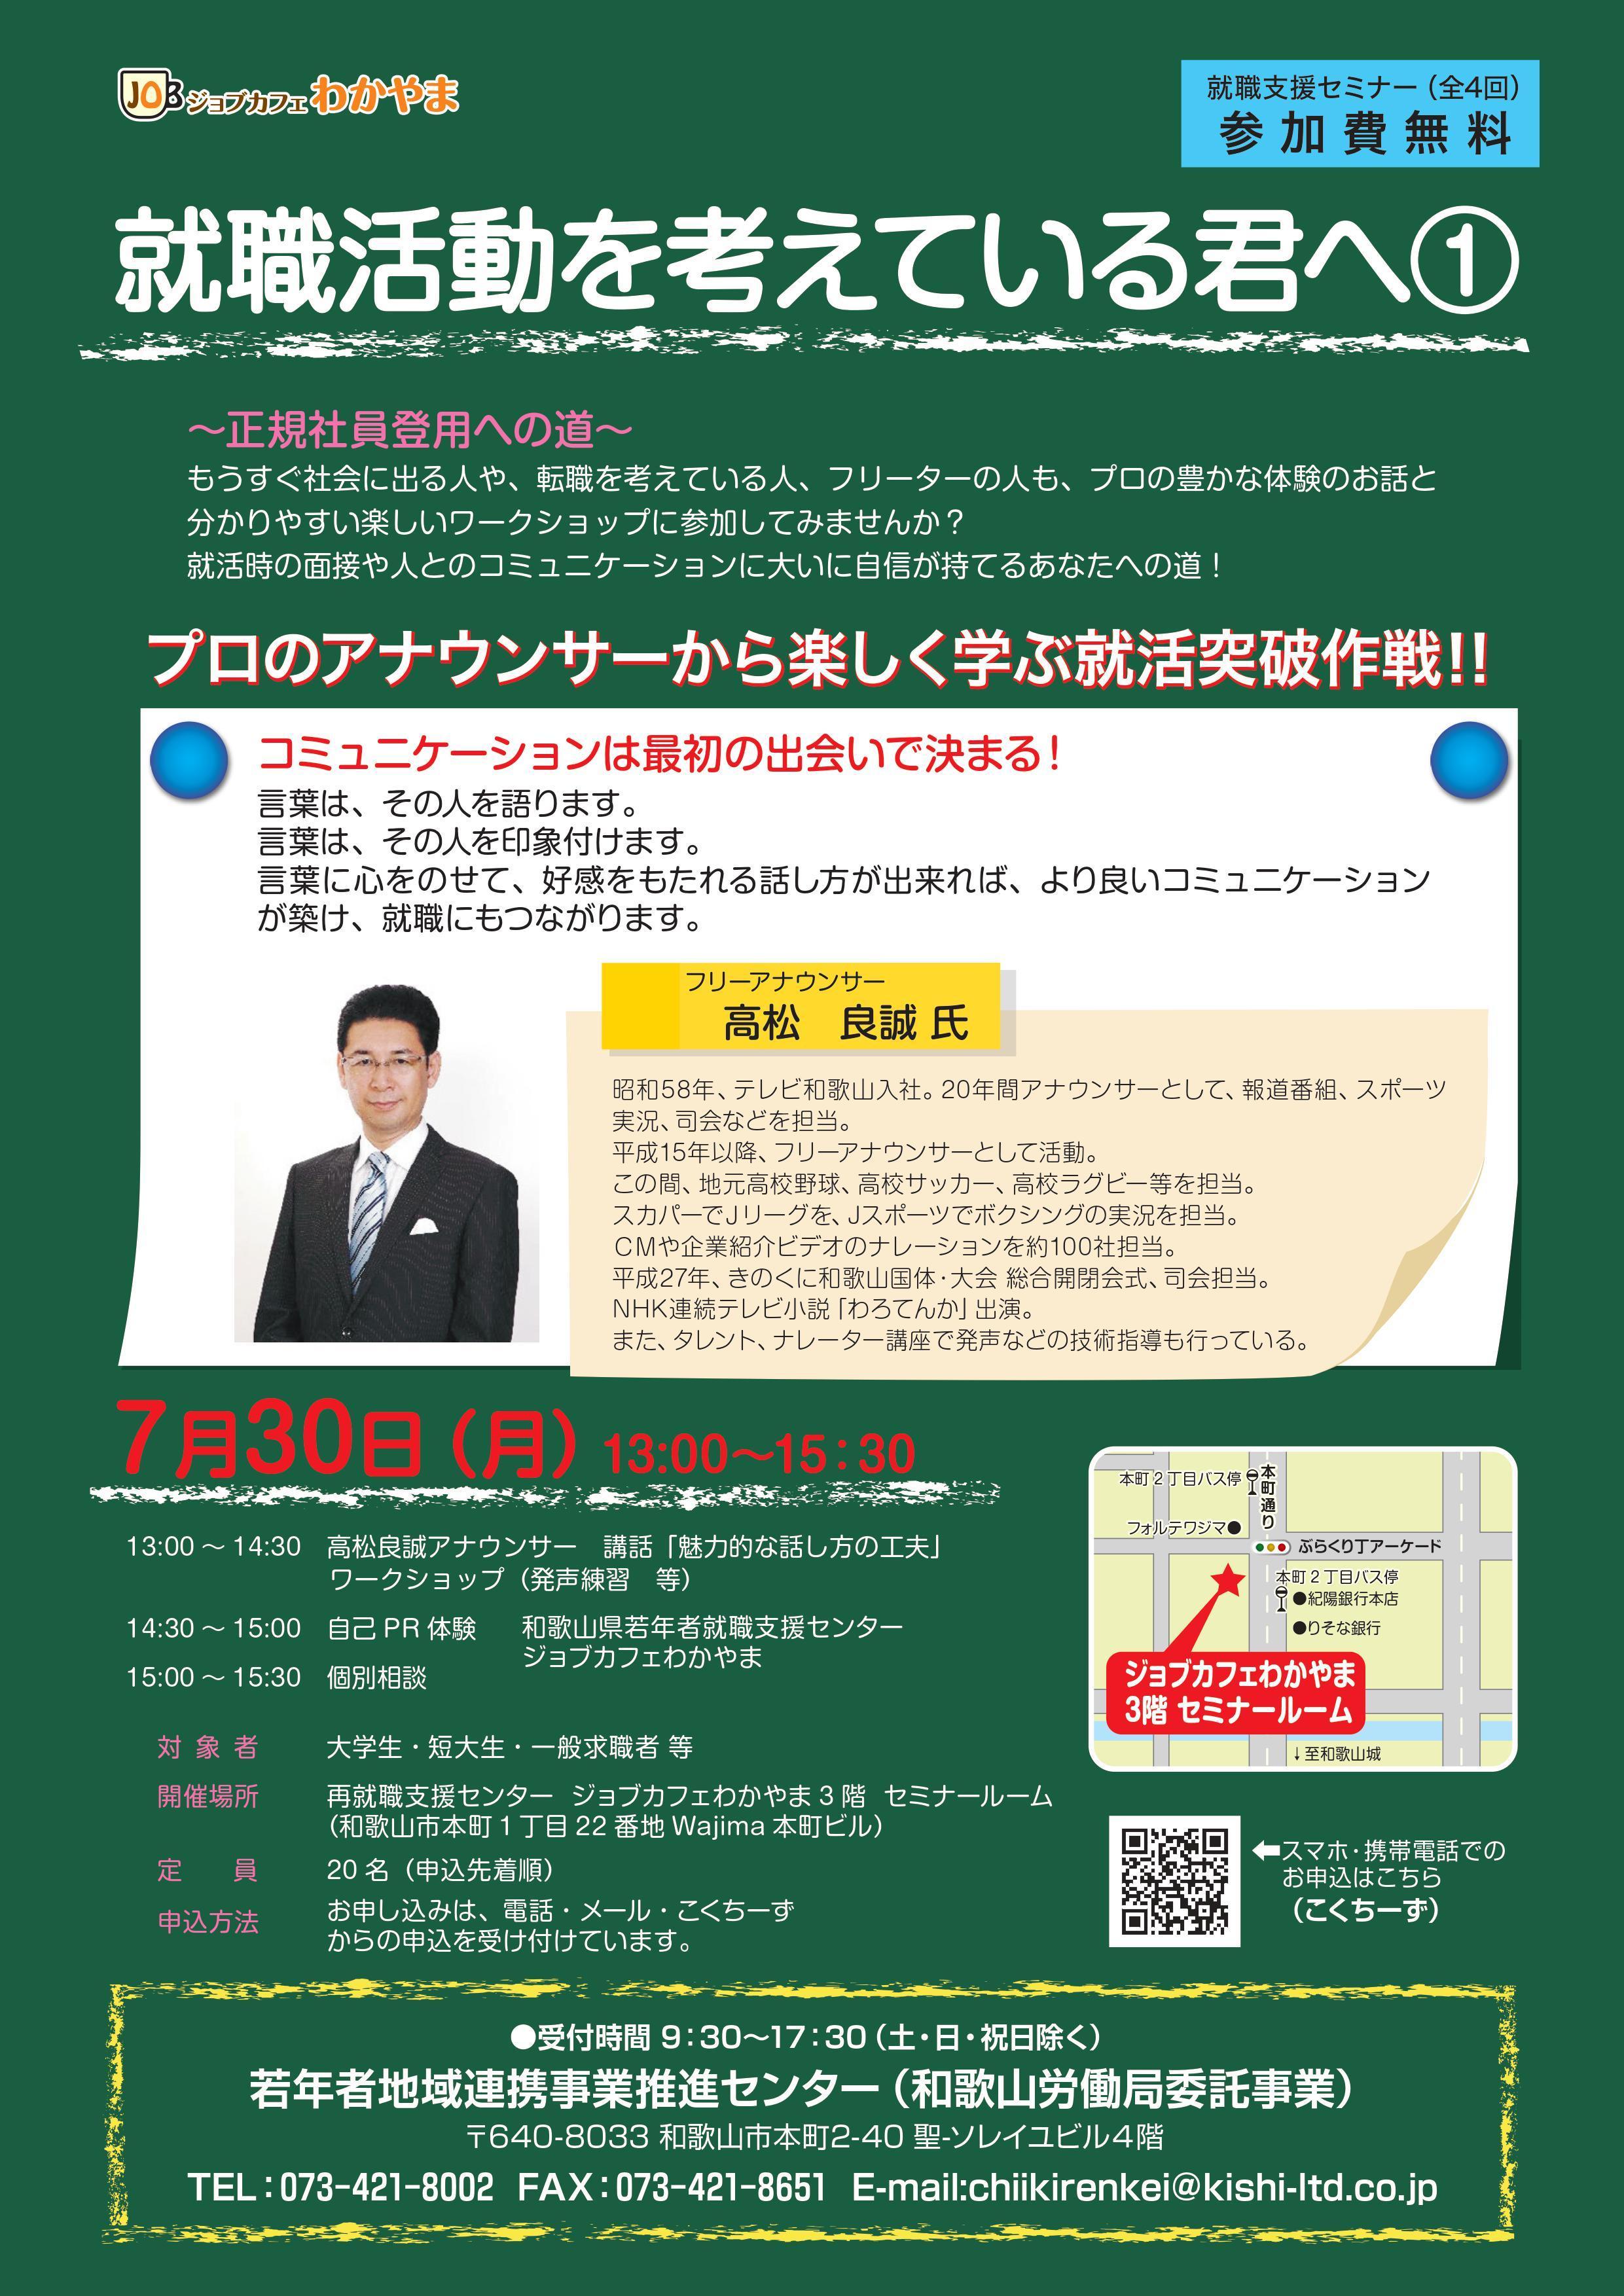 http://osakajobfair.com/event/b6a7d34b12574f2432e56039664a7852343e9ba5.jpg